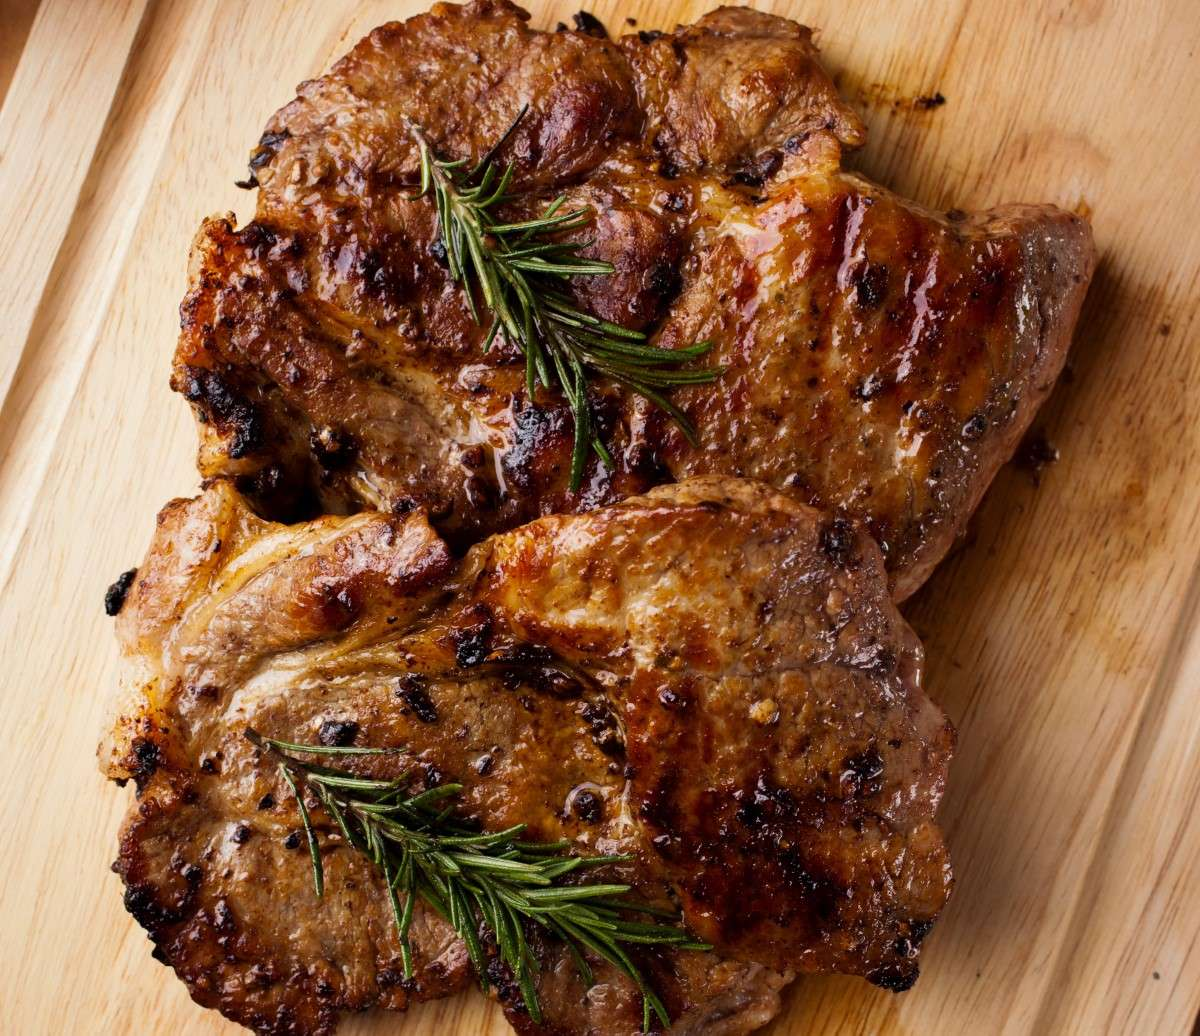 Garlic Rosemary Pork Chops